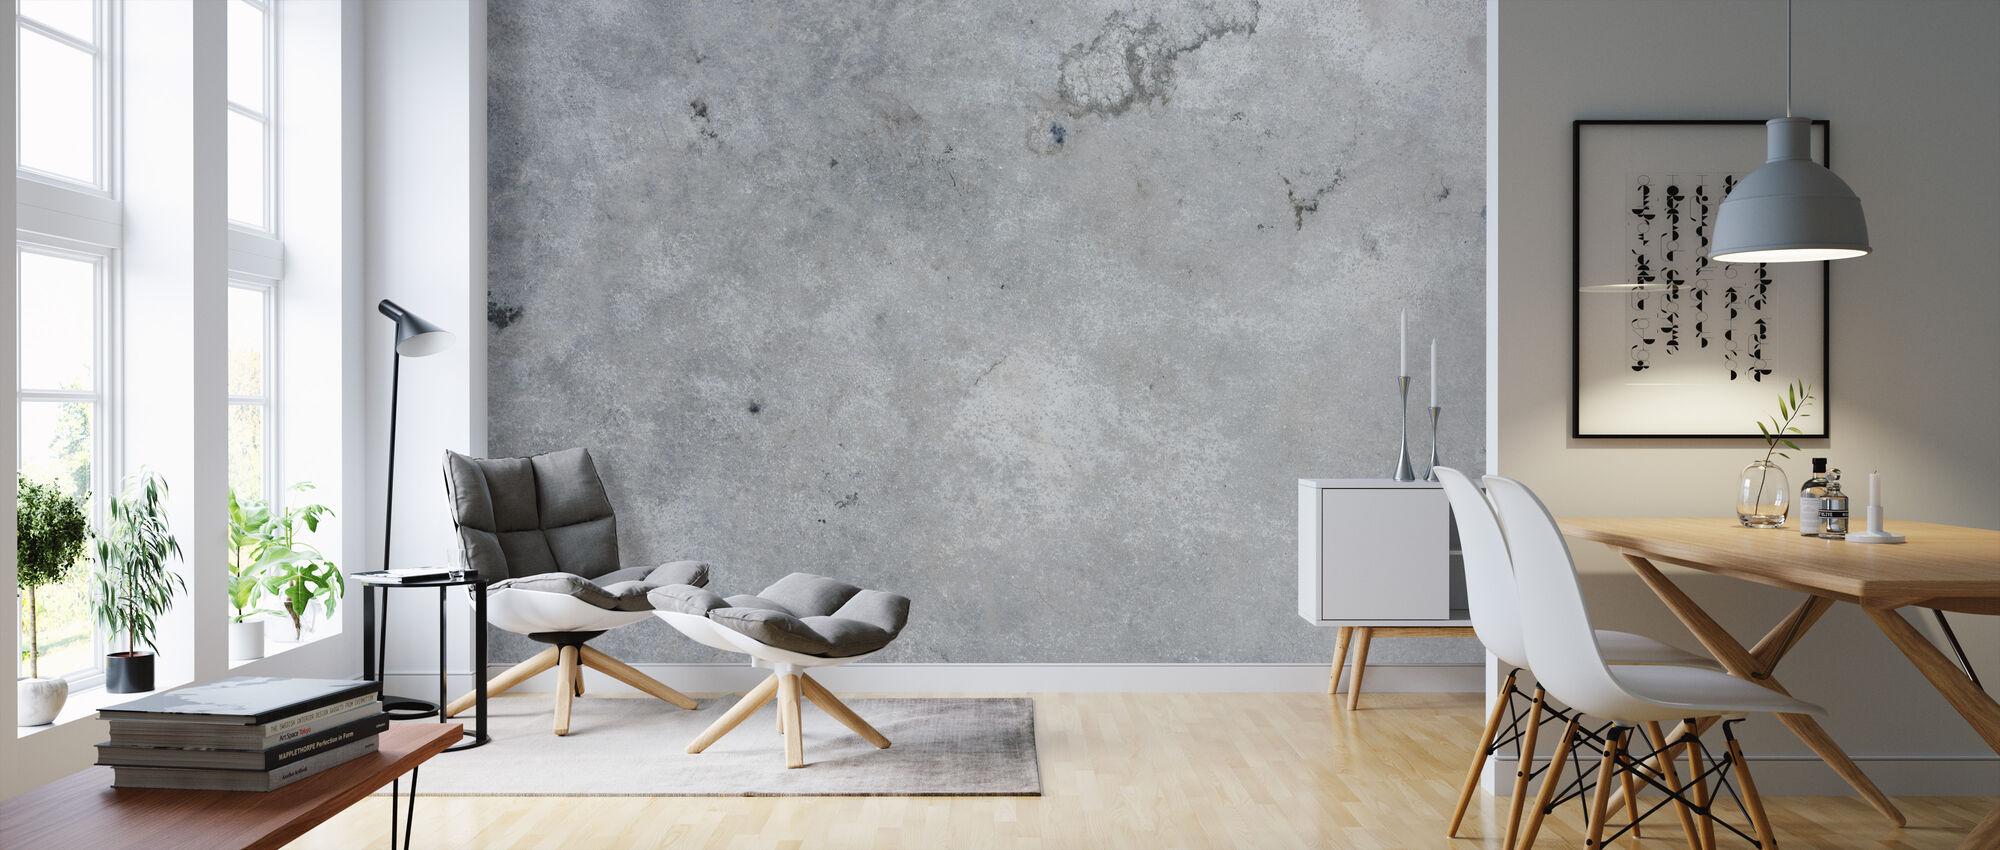 Gebleekte betonnen muur - Behang - Woonkamer